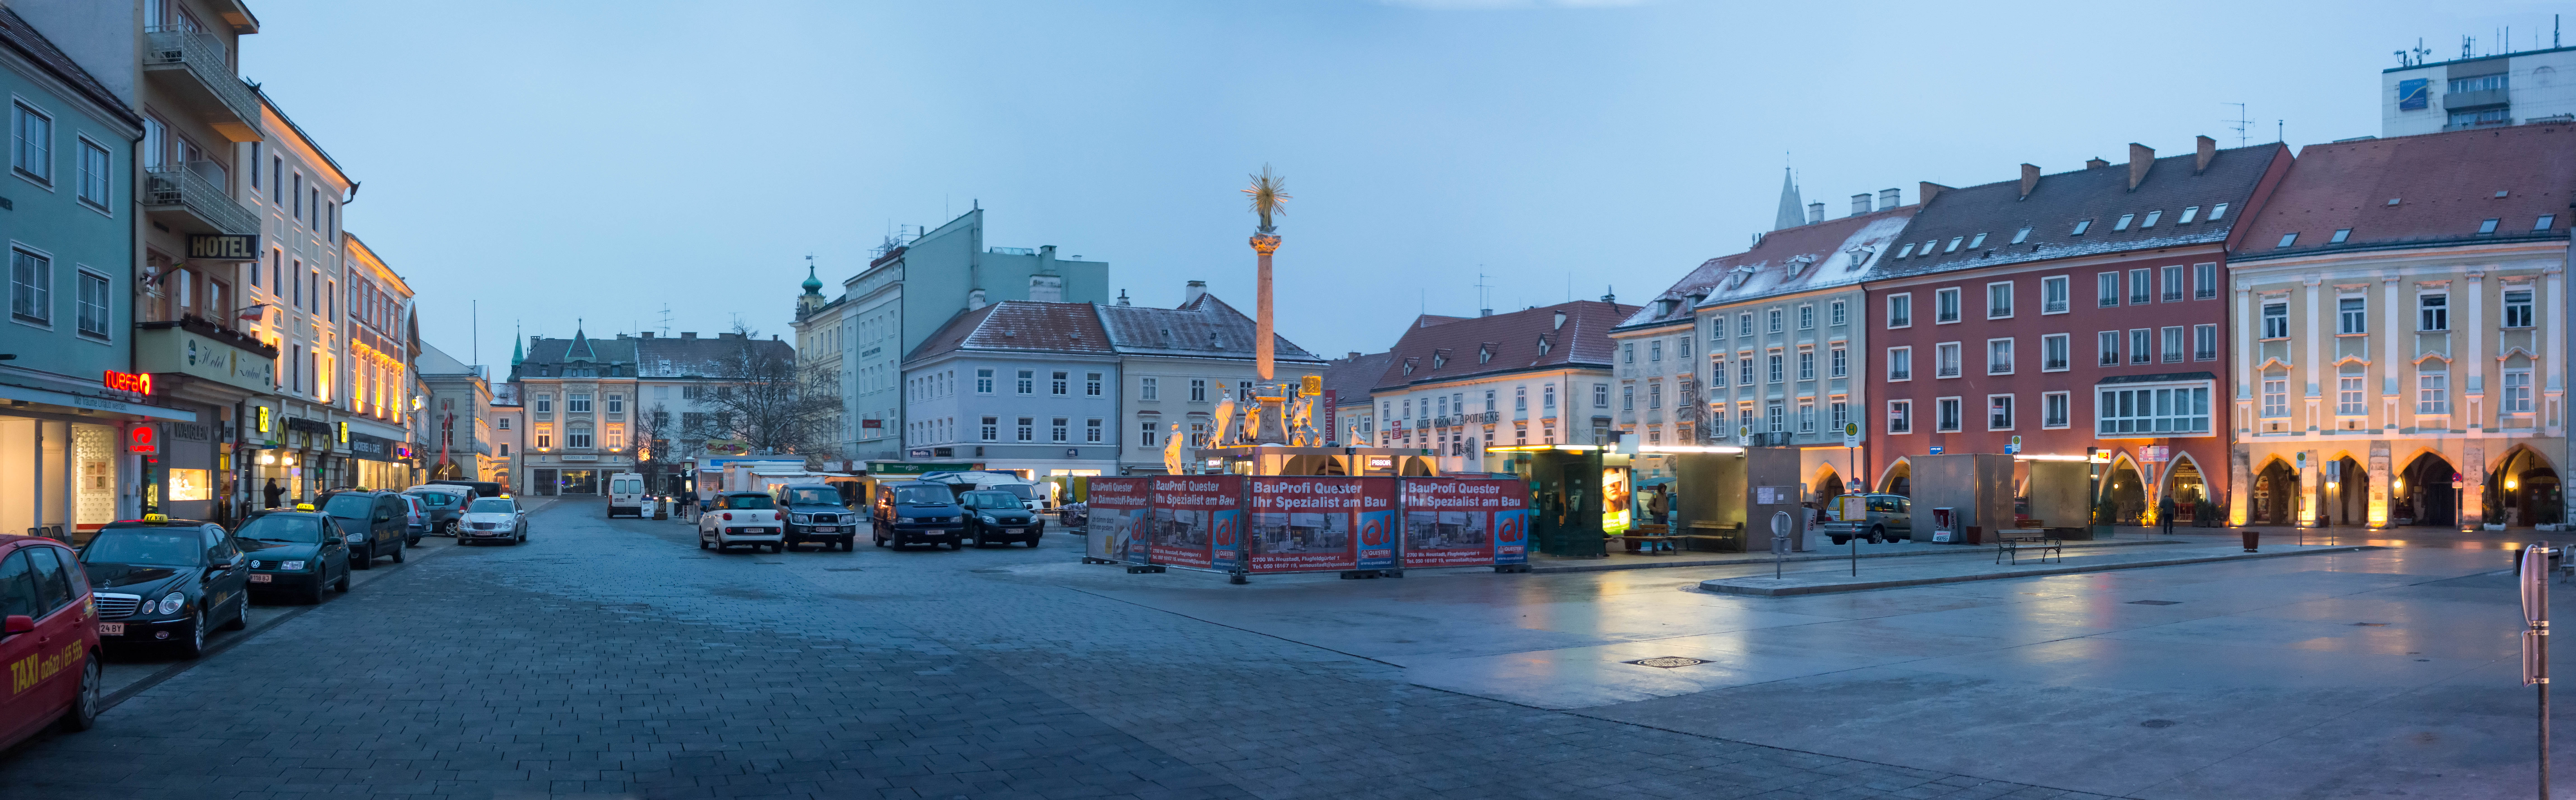 FilePanorama Hauptplatz Wiener Neustadt, 25012014 zur